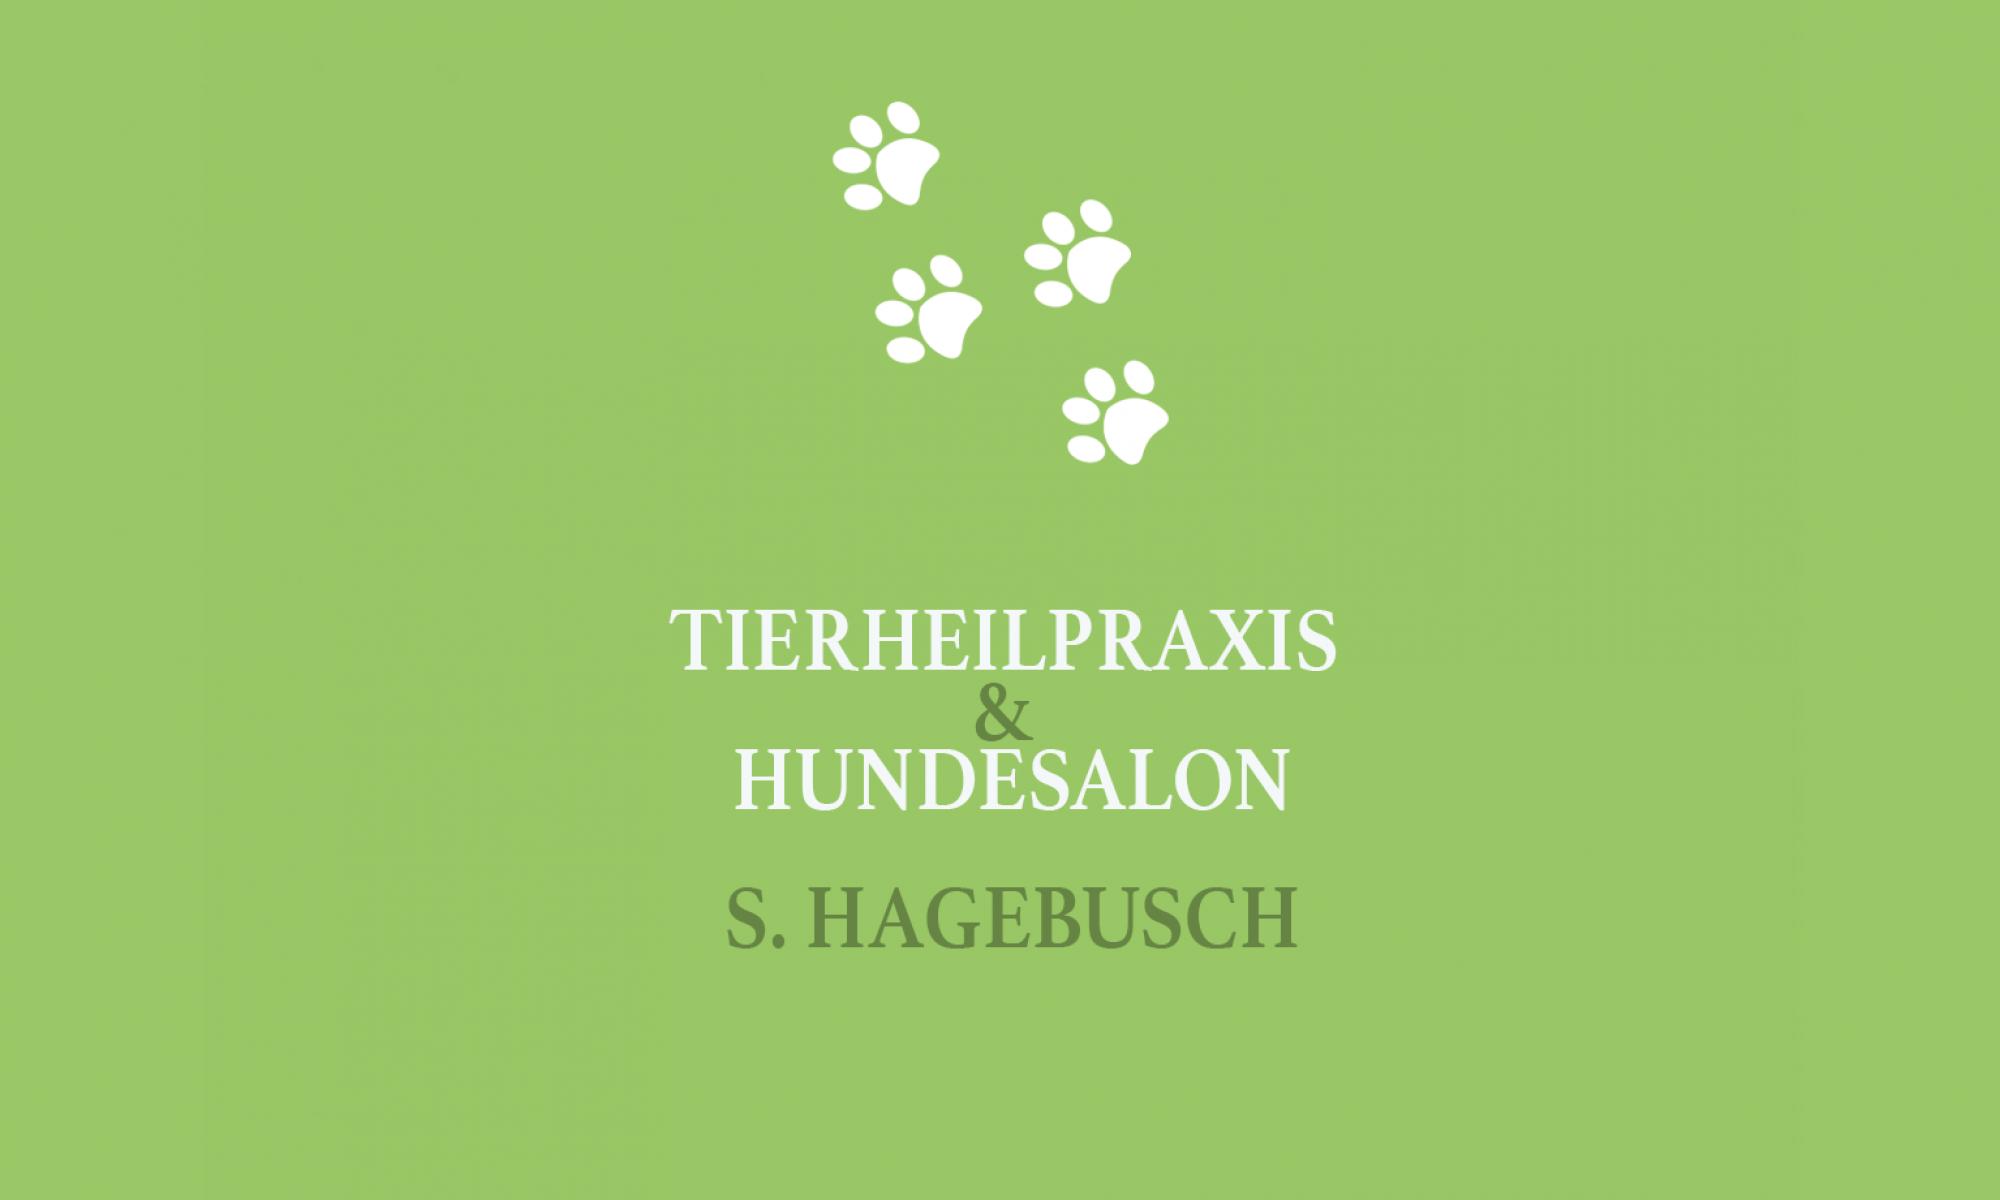 Tierheilpraxis & Hundesalon Hagebusch